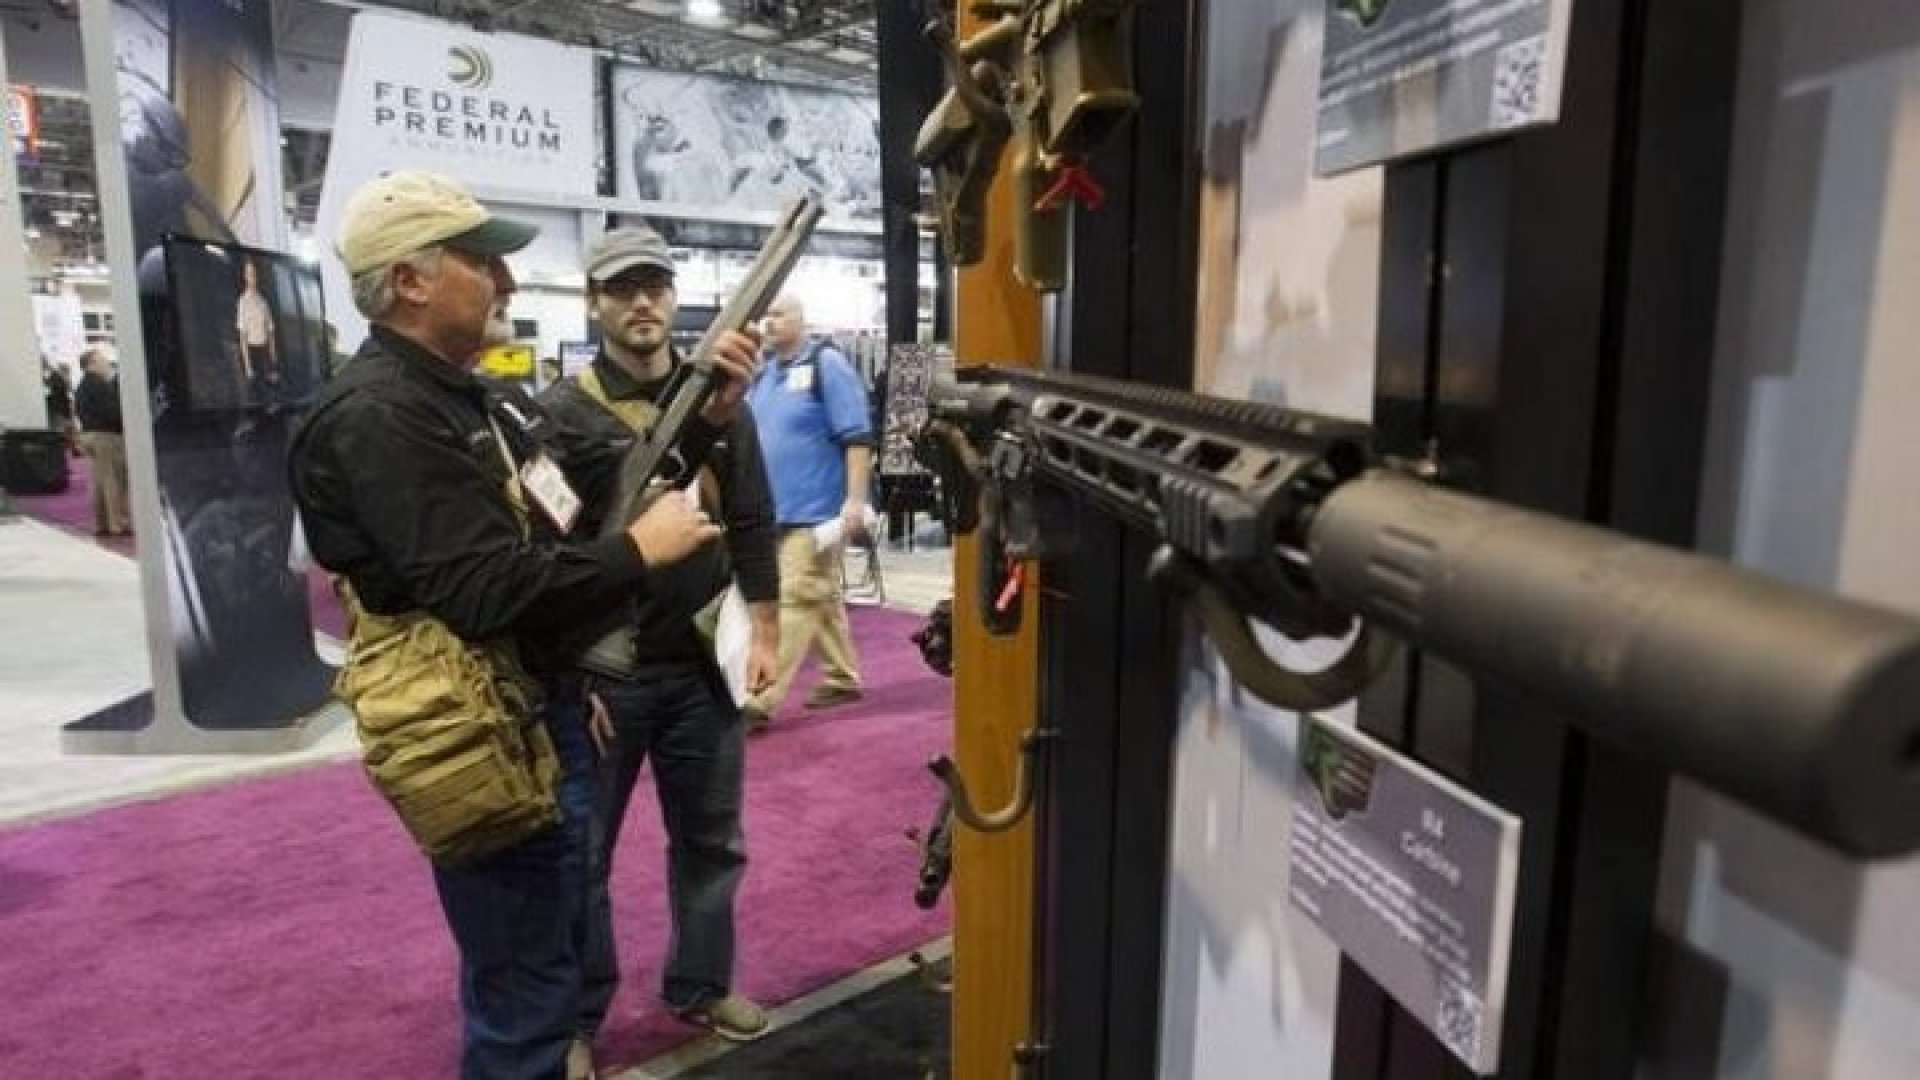 Remington Model 783 Scoped Sintetic Negru cal.: 30-06 sau 300 WinMag. cu luneta montata pe arma